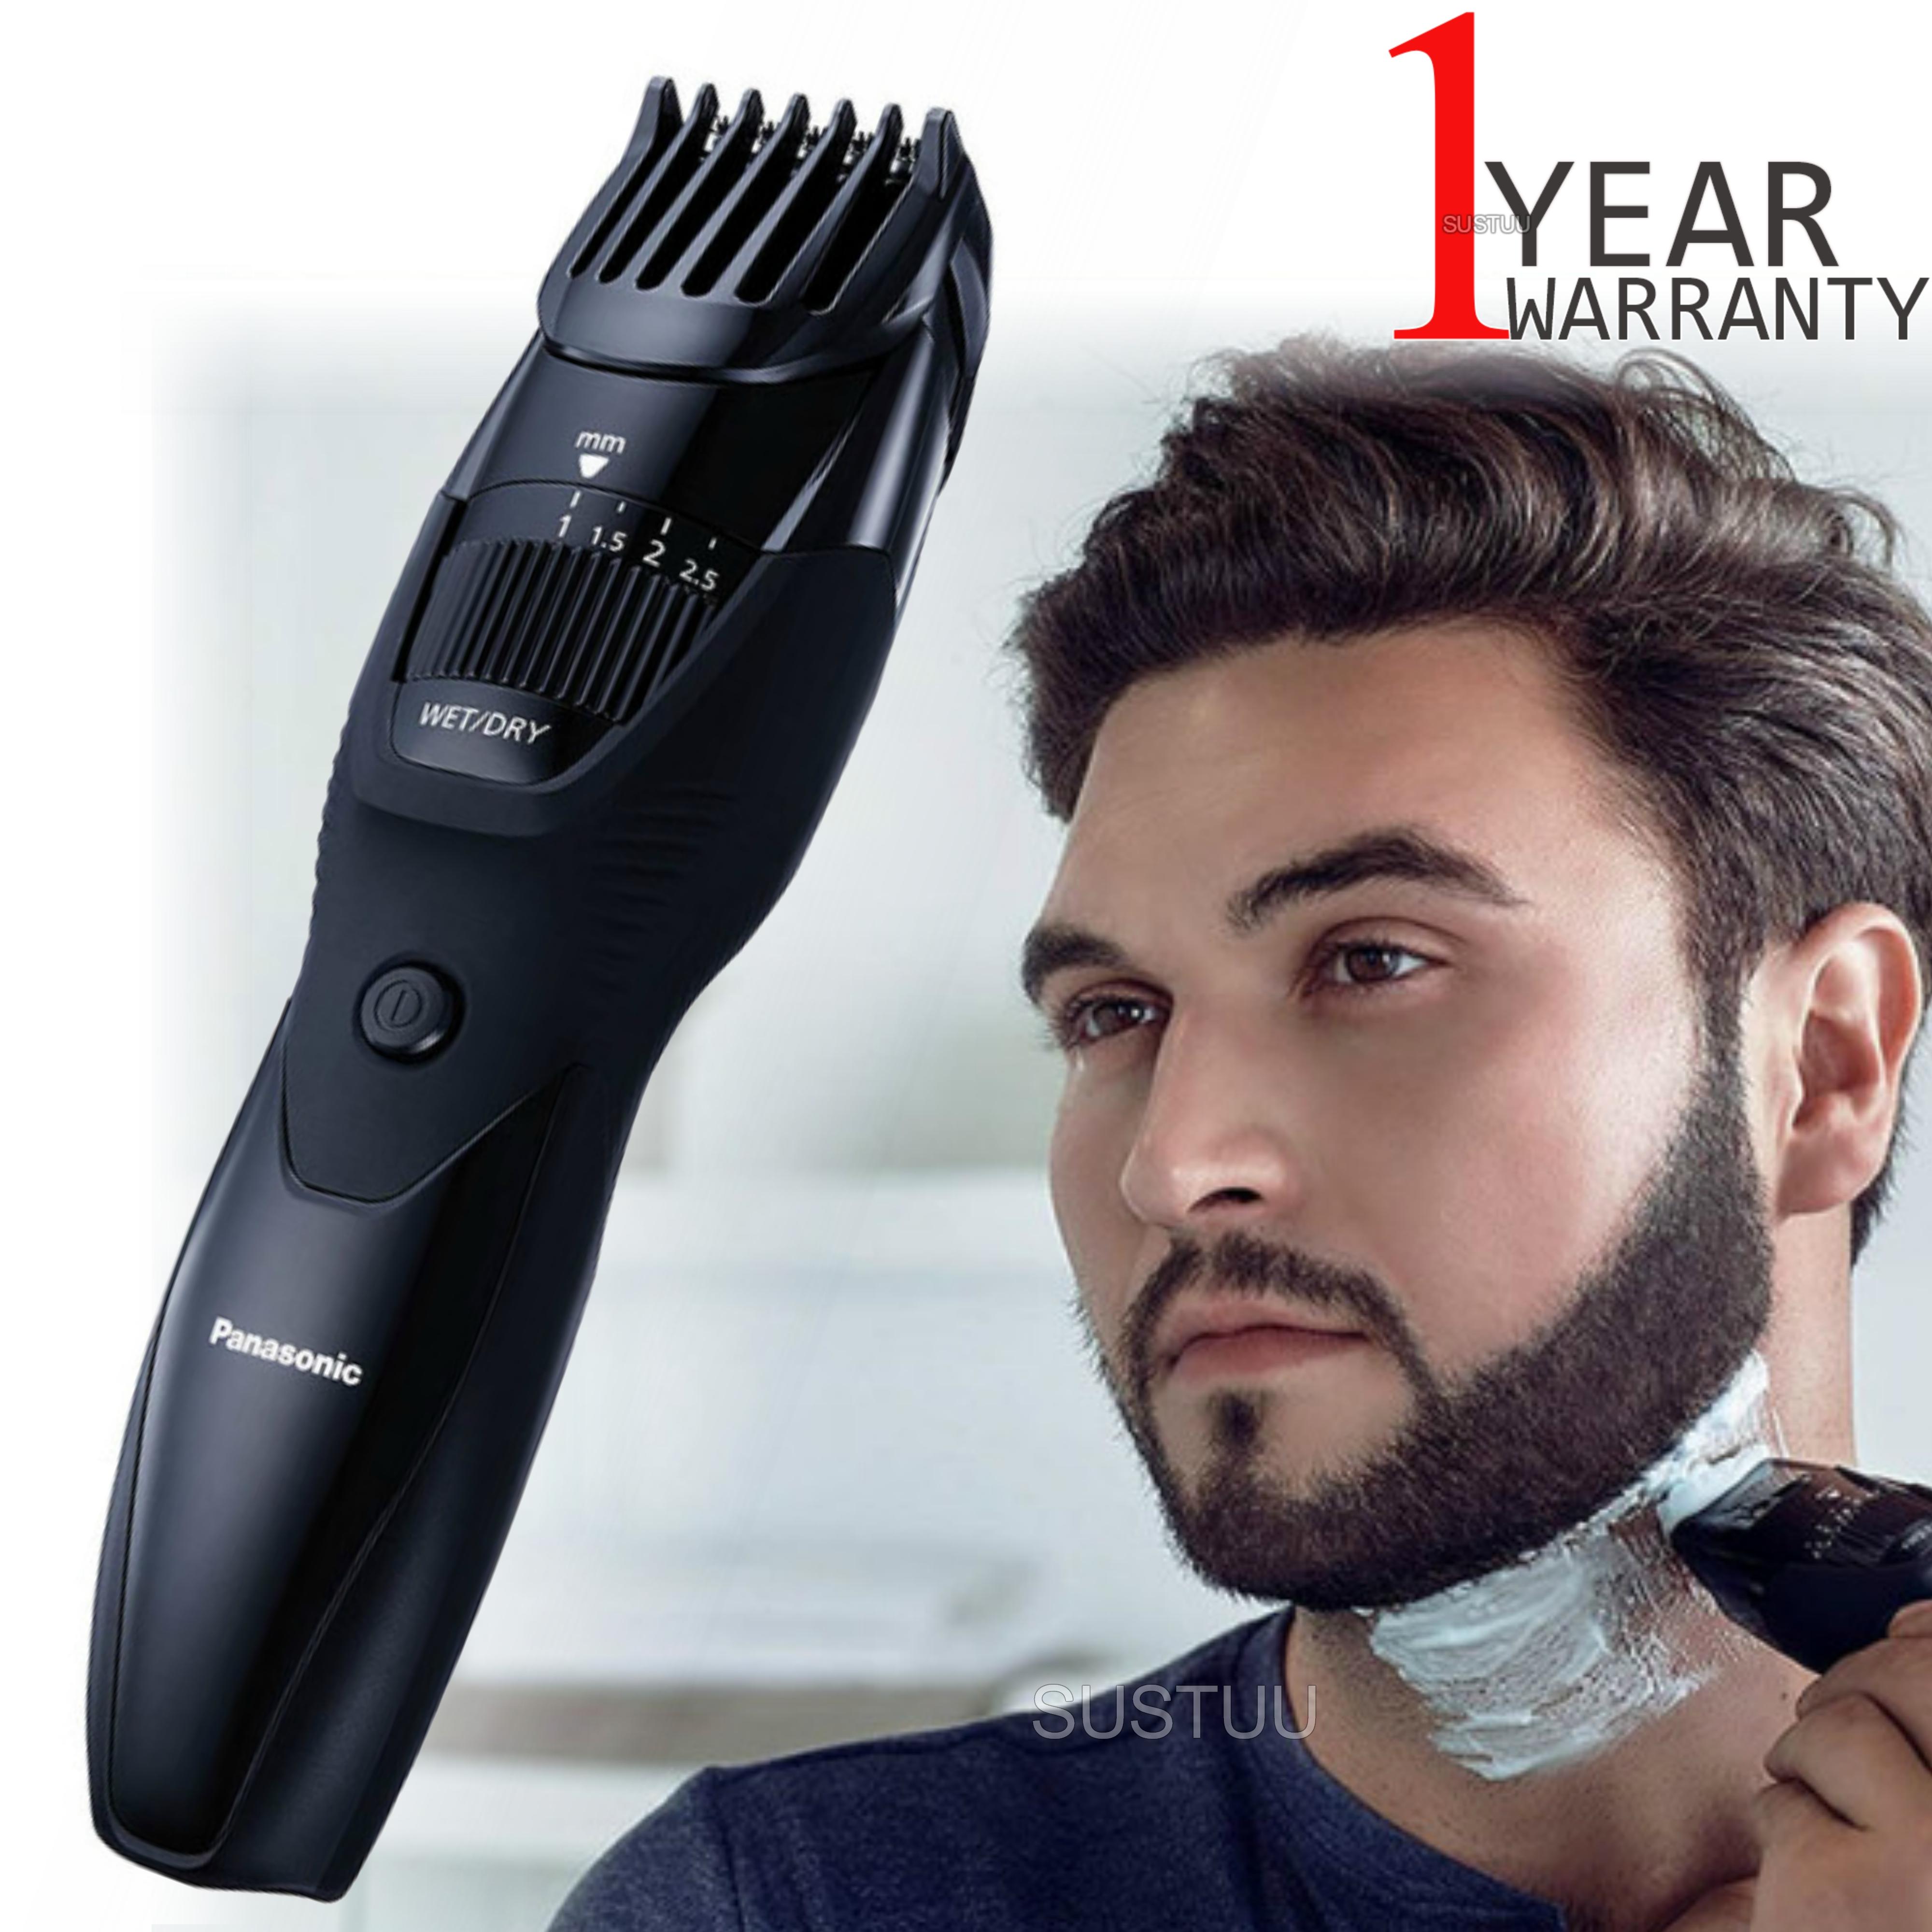 Panasonic ERGB42K Men's Hair-Beard-Moustache Trimmer | Rechargeable | Cordless | Black